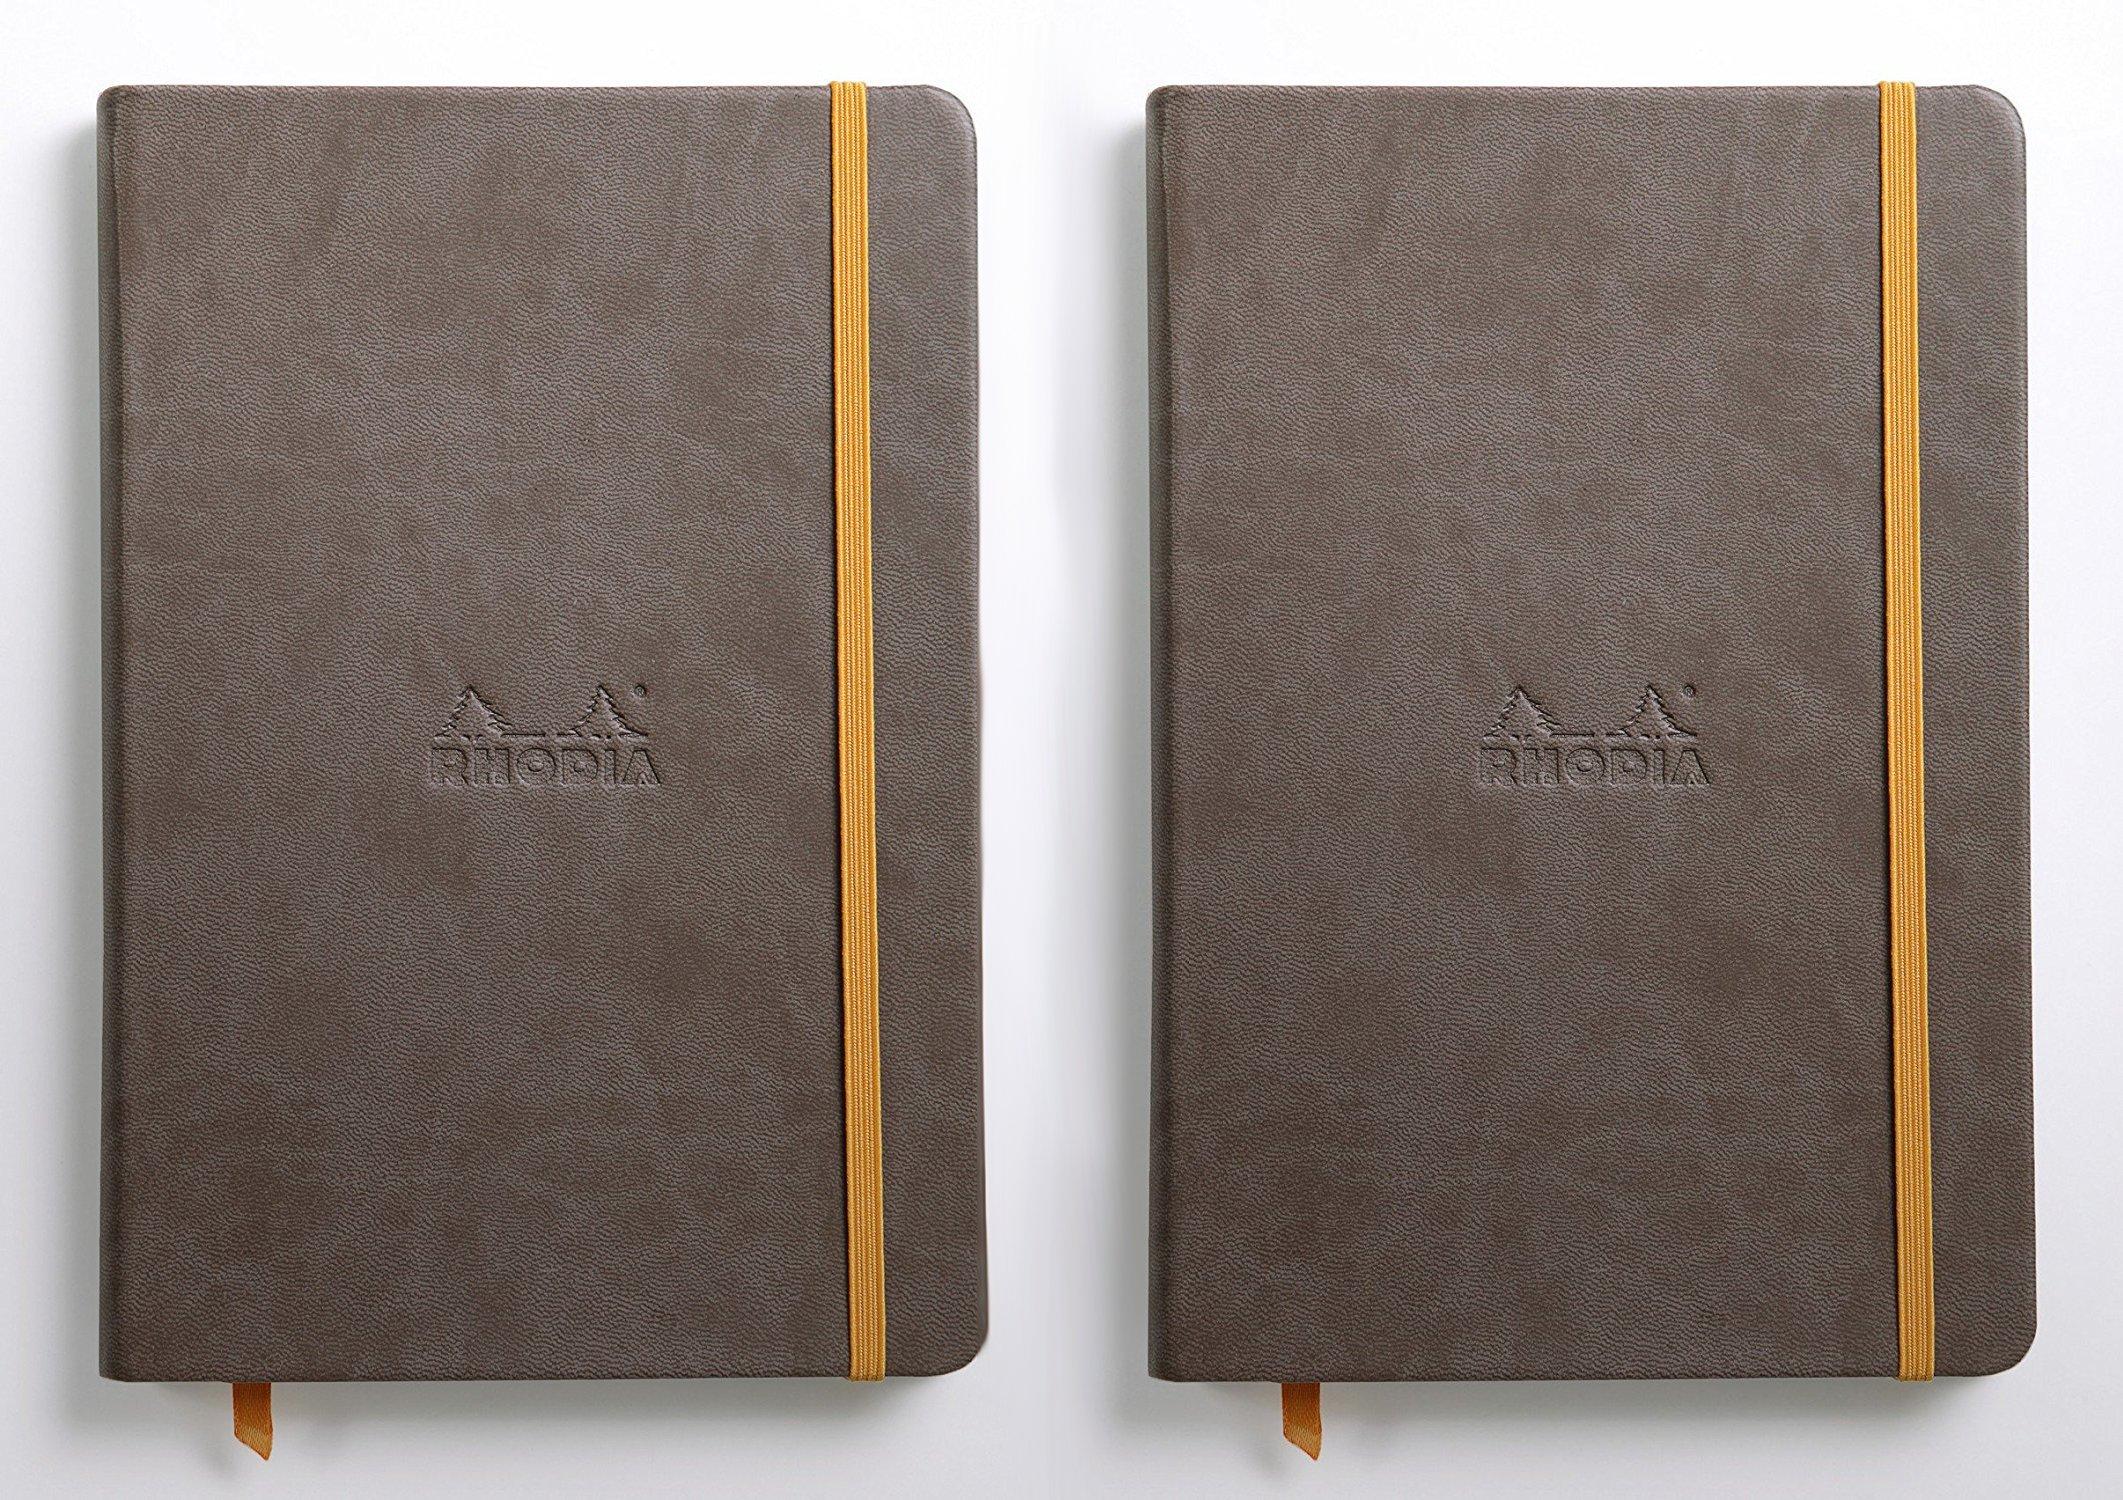 Pack of 2 Rhodia Rhodiarama A5 Webnotebook, 5.5 in x 8.25, Lined - Chocolate (118743)